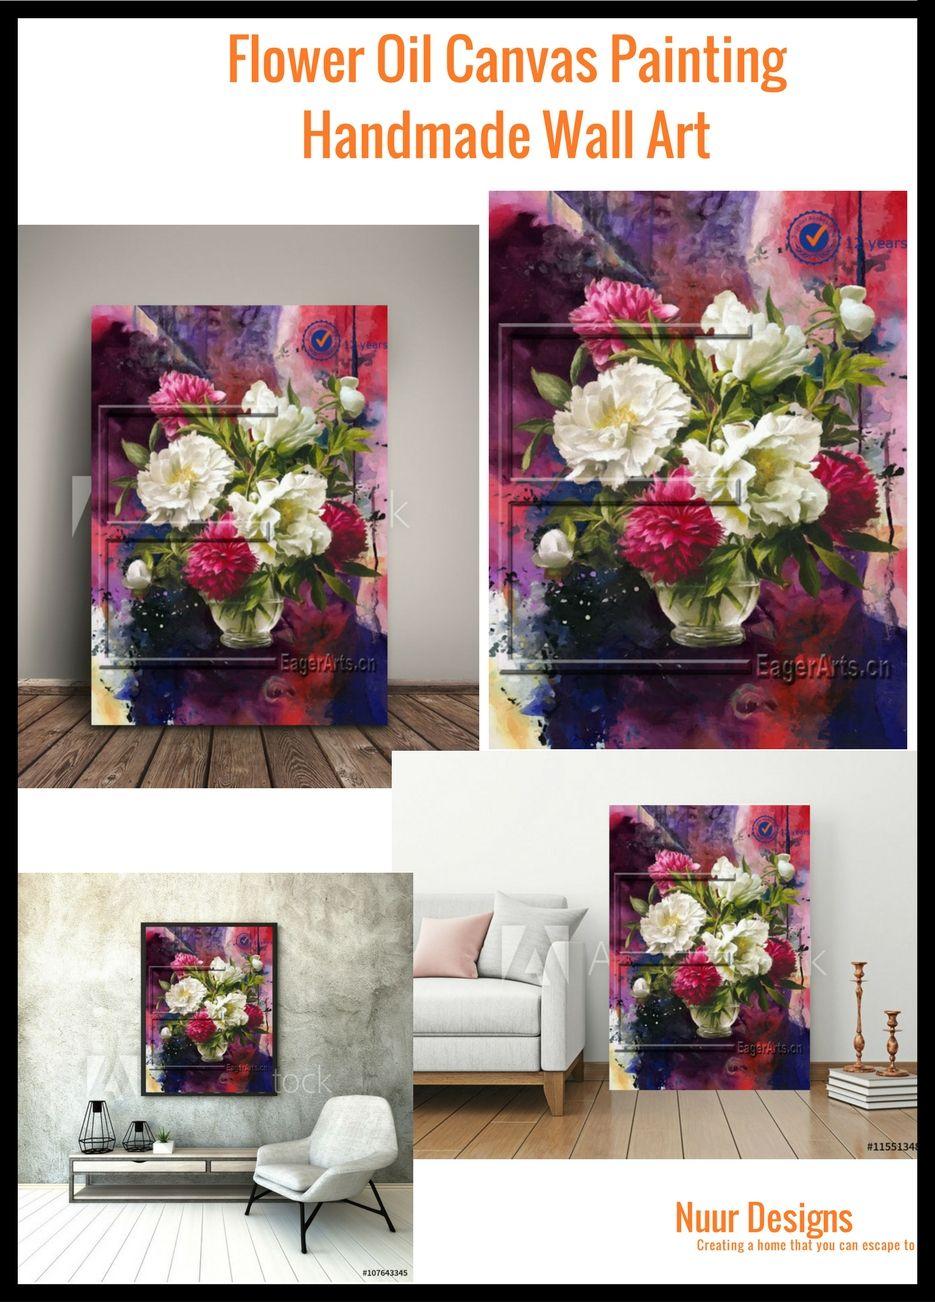 Flower Oil Canvas Painting Handmade Red White Purple Wall Art Decor